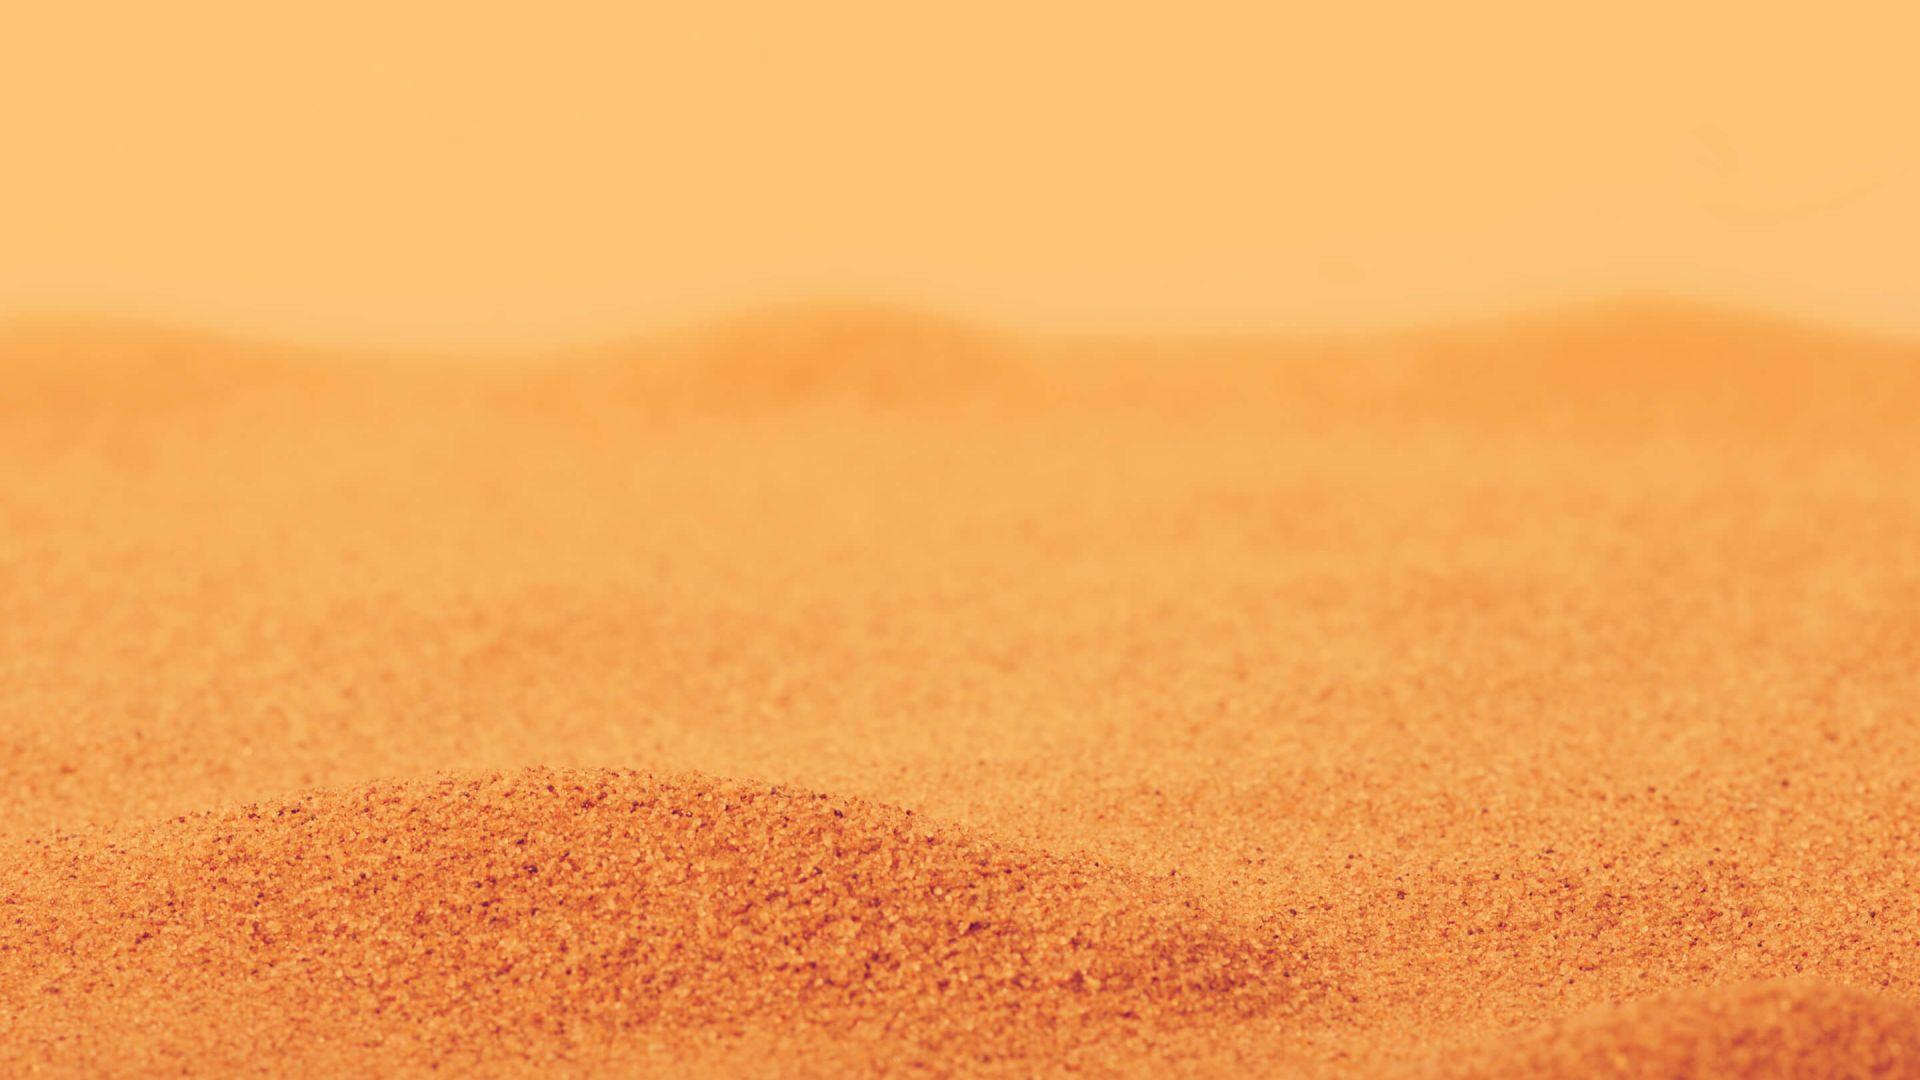 Sand Wallpaper